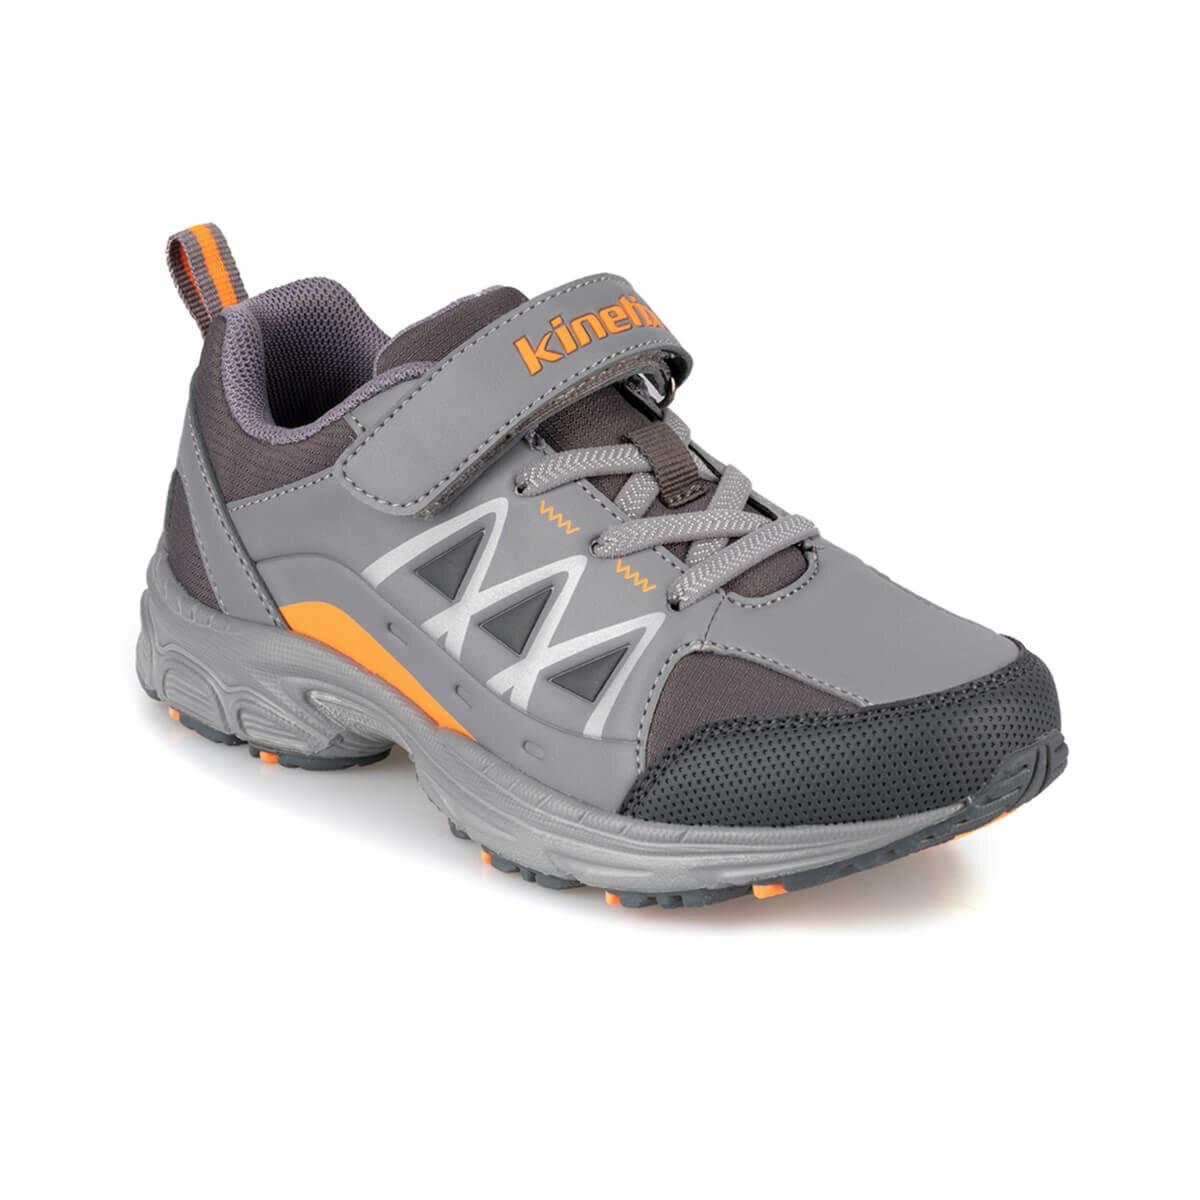 FLO VICTOR 9PR Dark Gray Male Child Hiking Shoes KINETIX